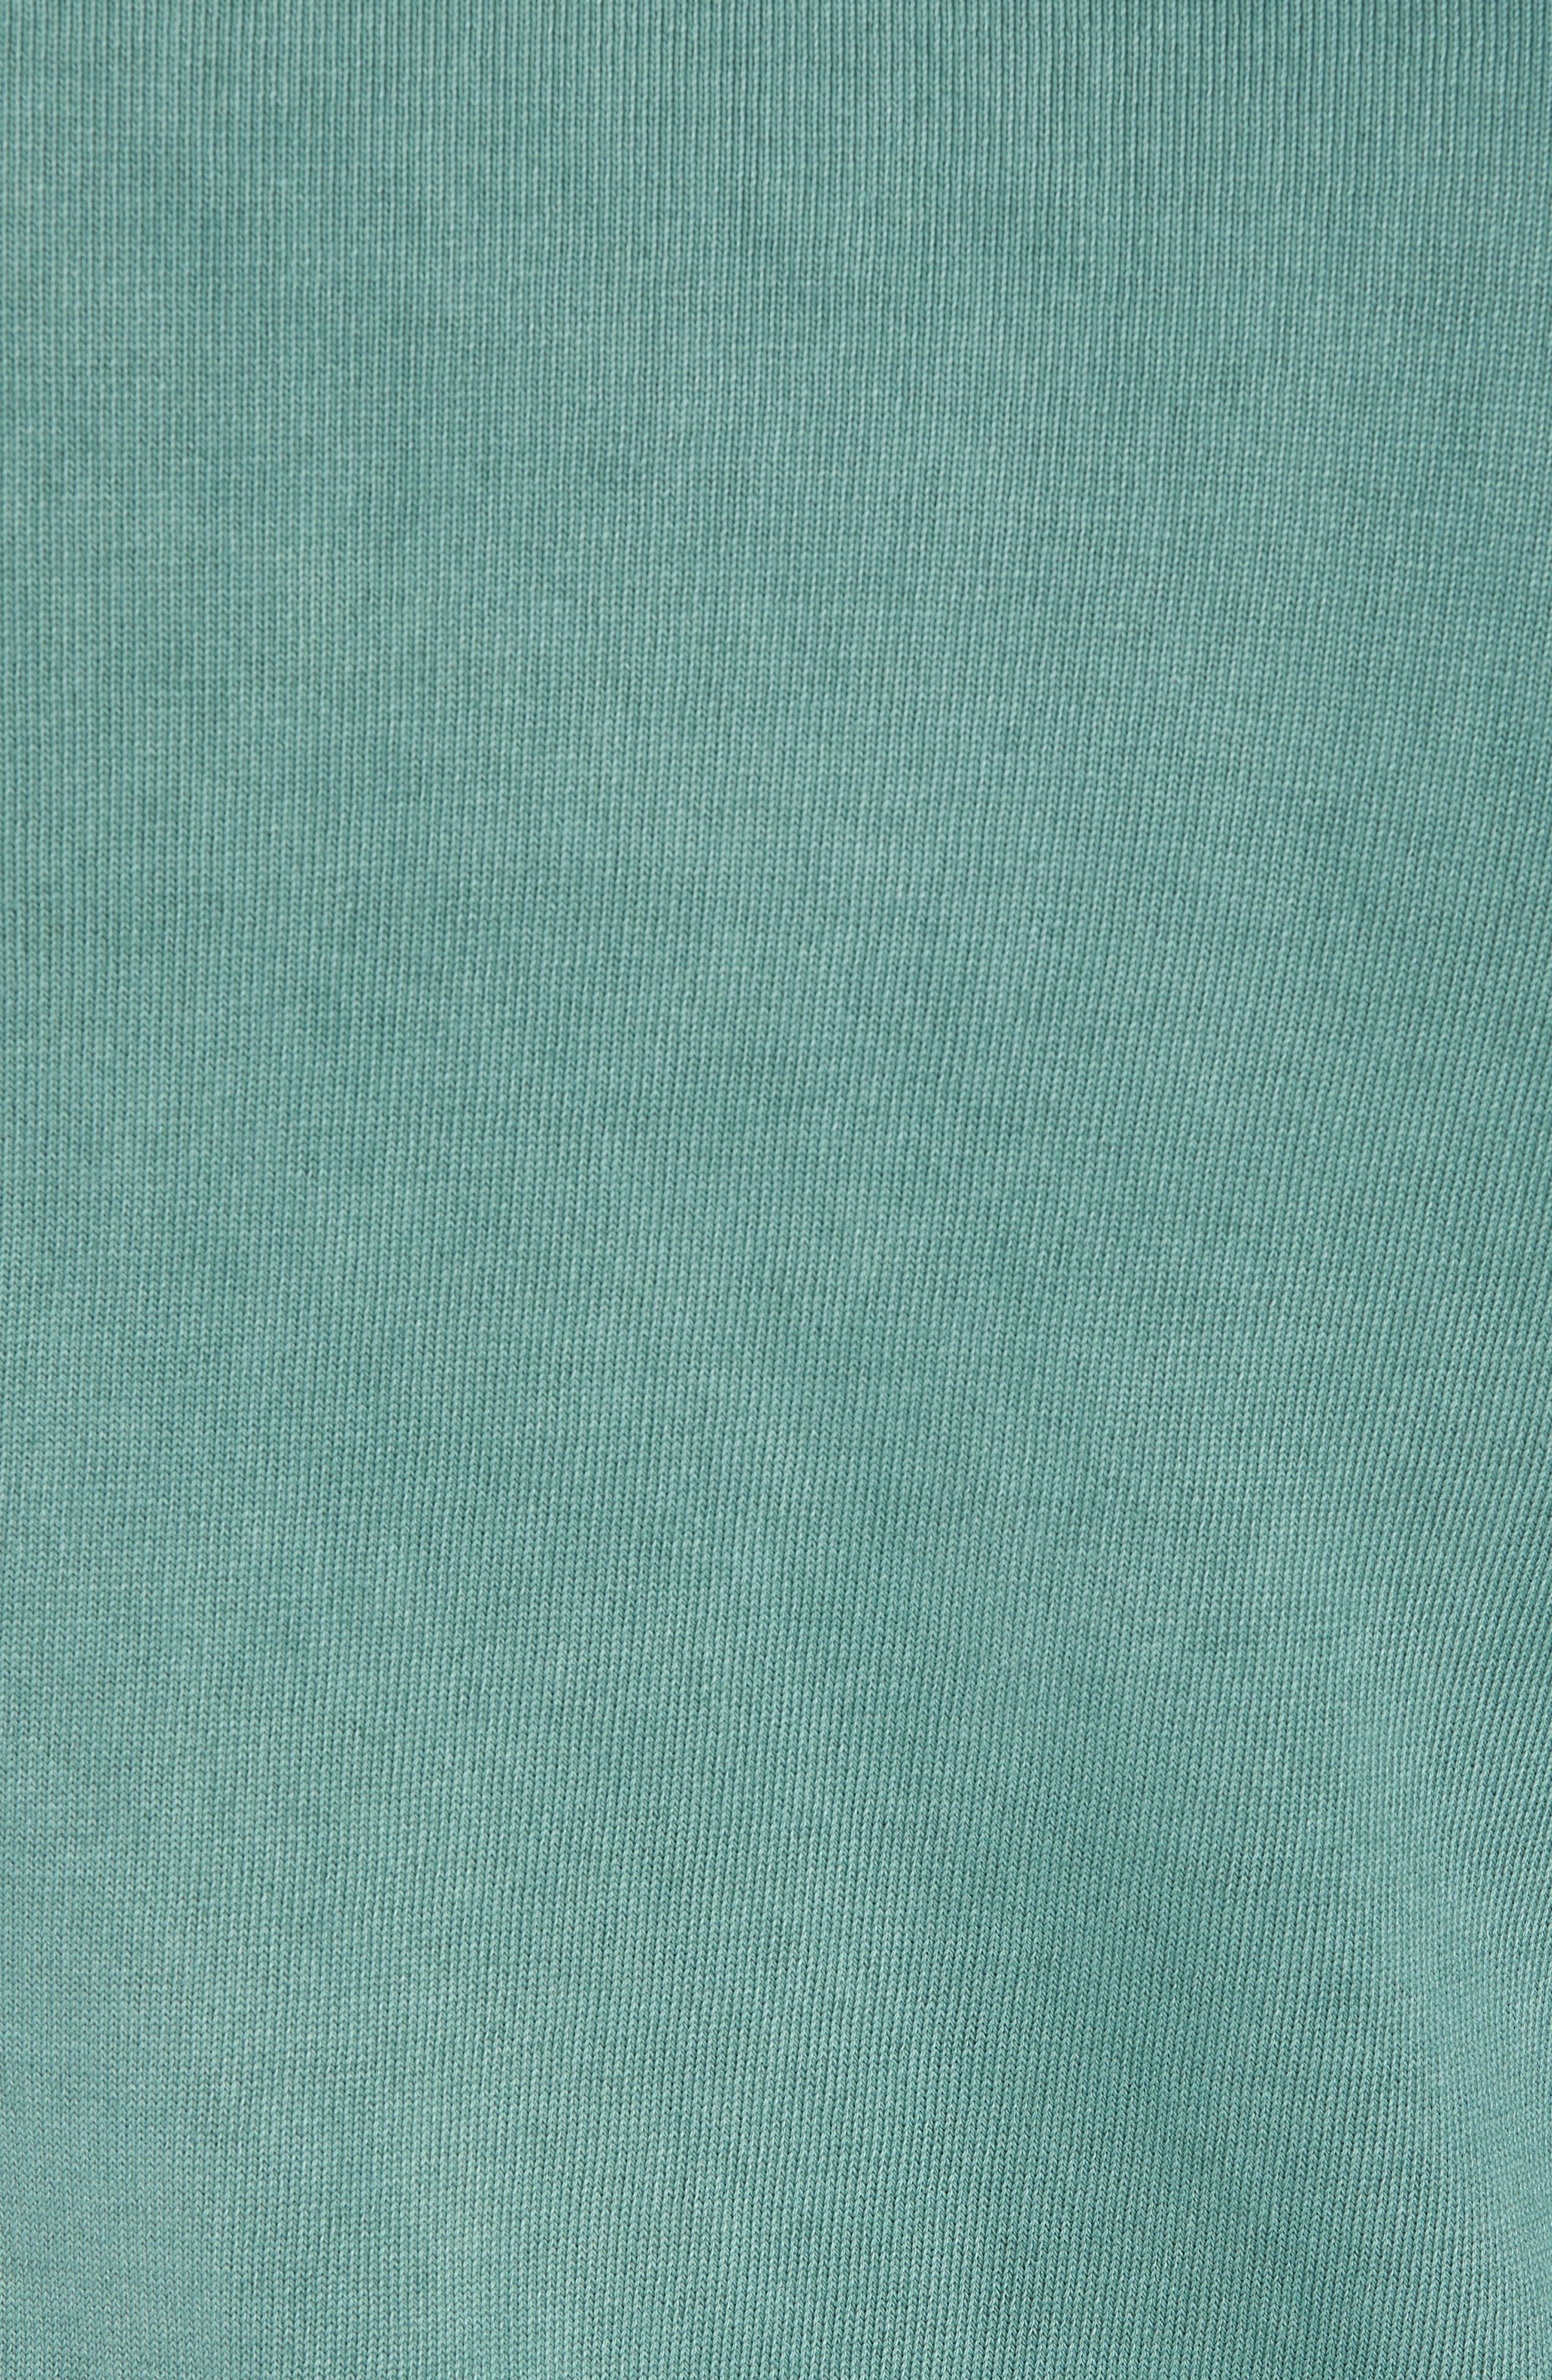 Stonewash Cotton Sweatshirt,                             Alternate thumbnail 5, color,                             Washed Sage